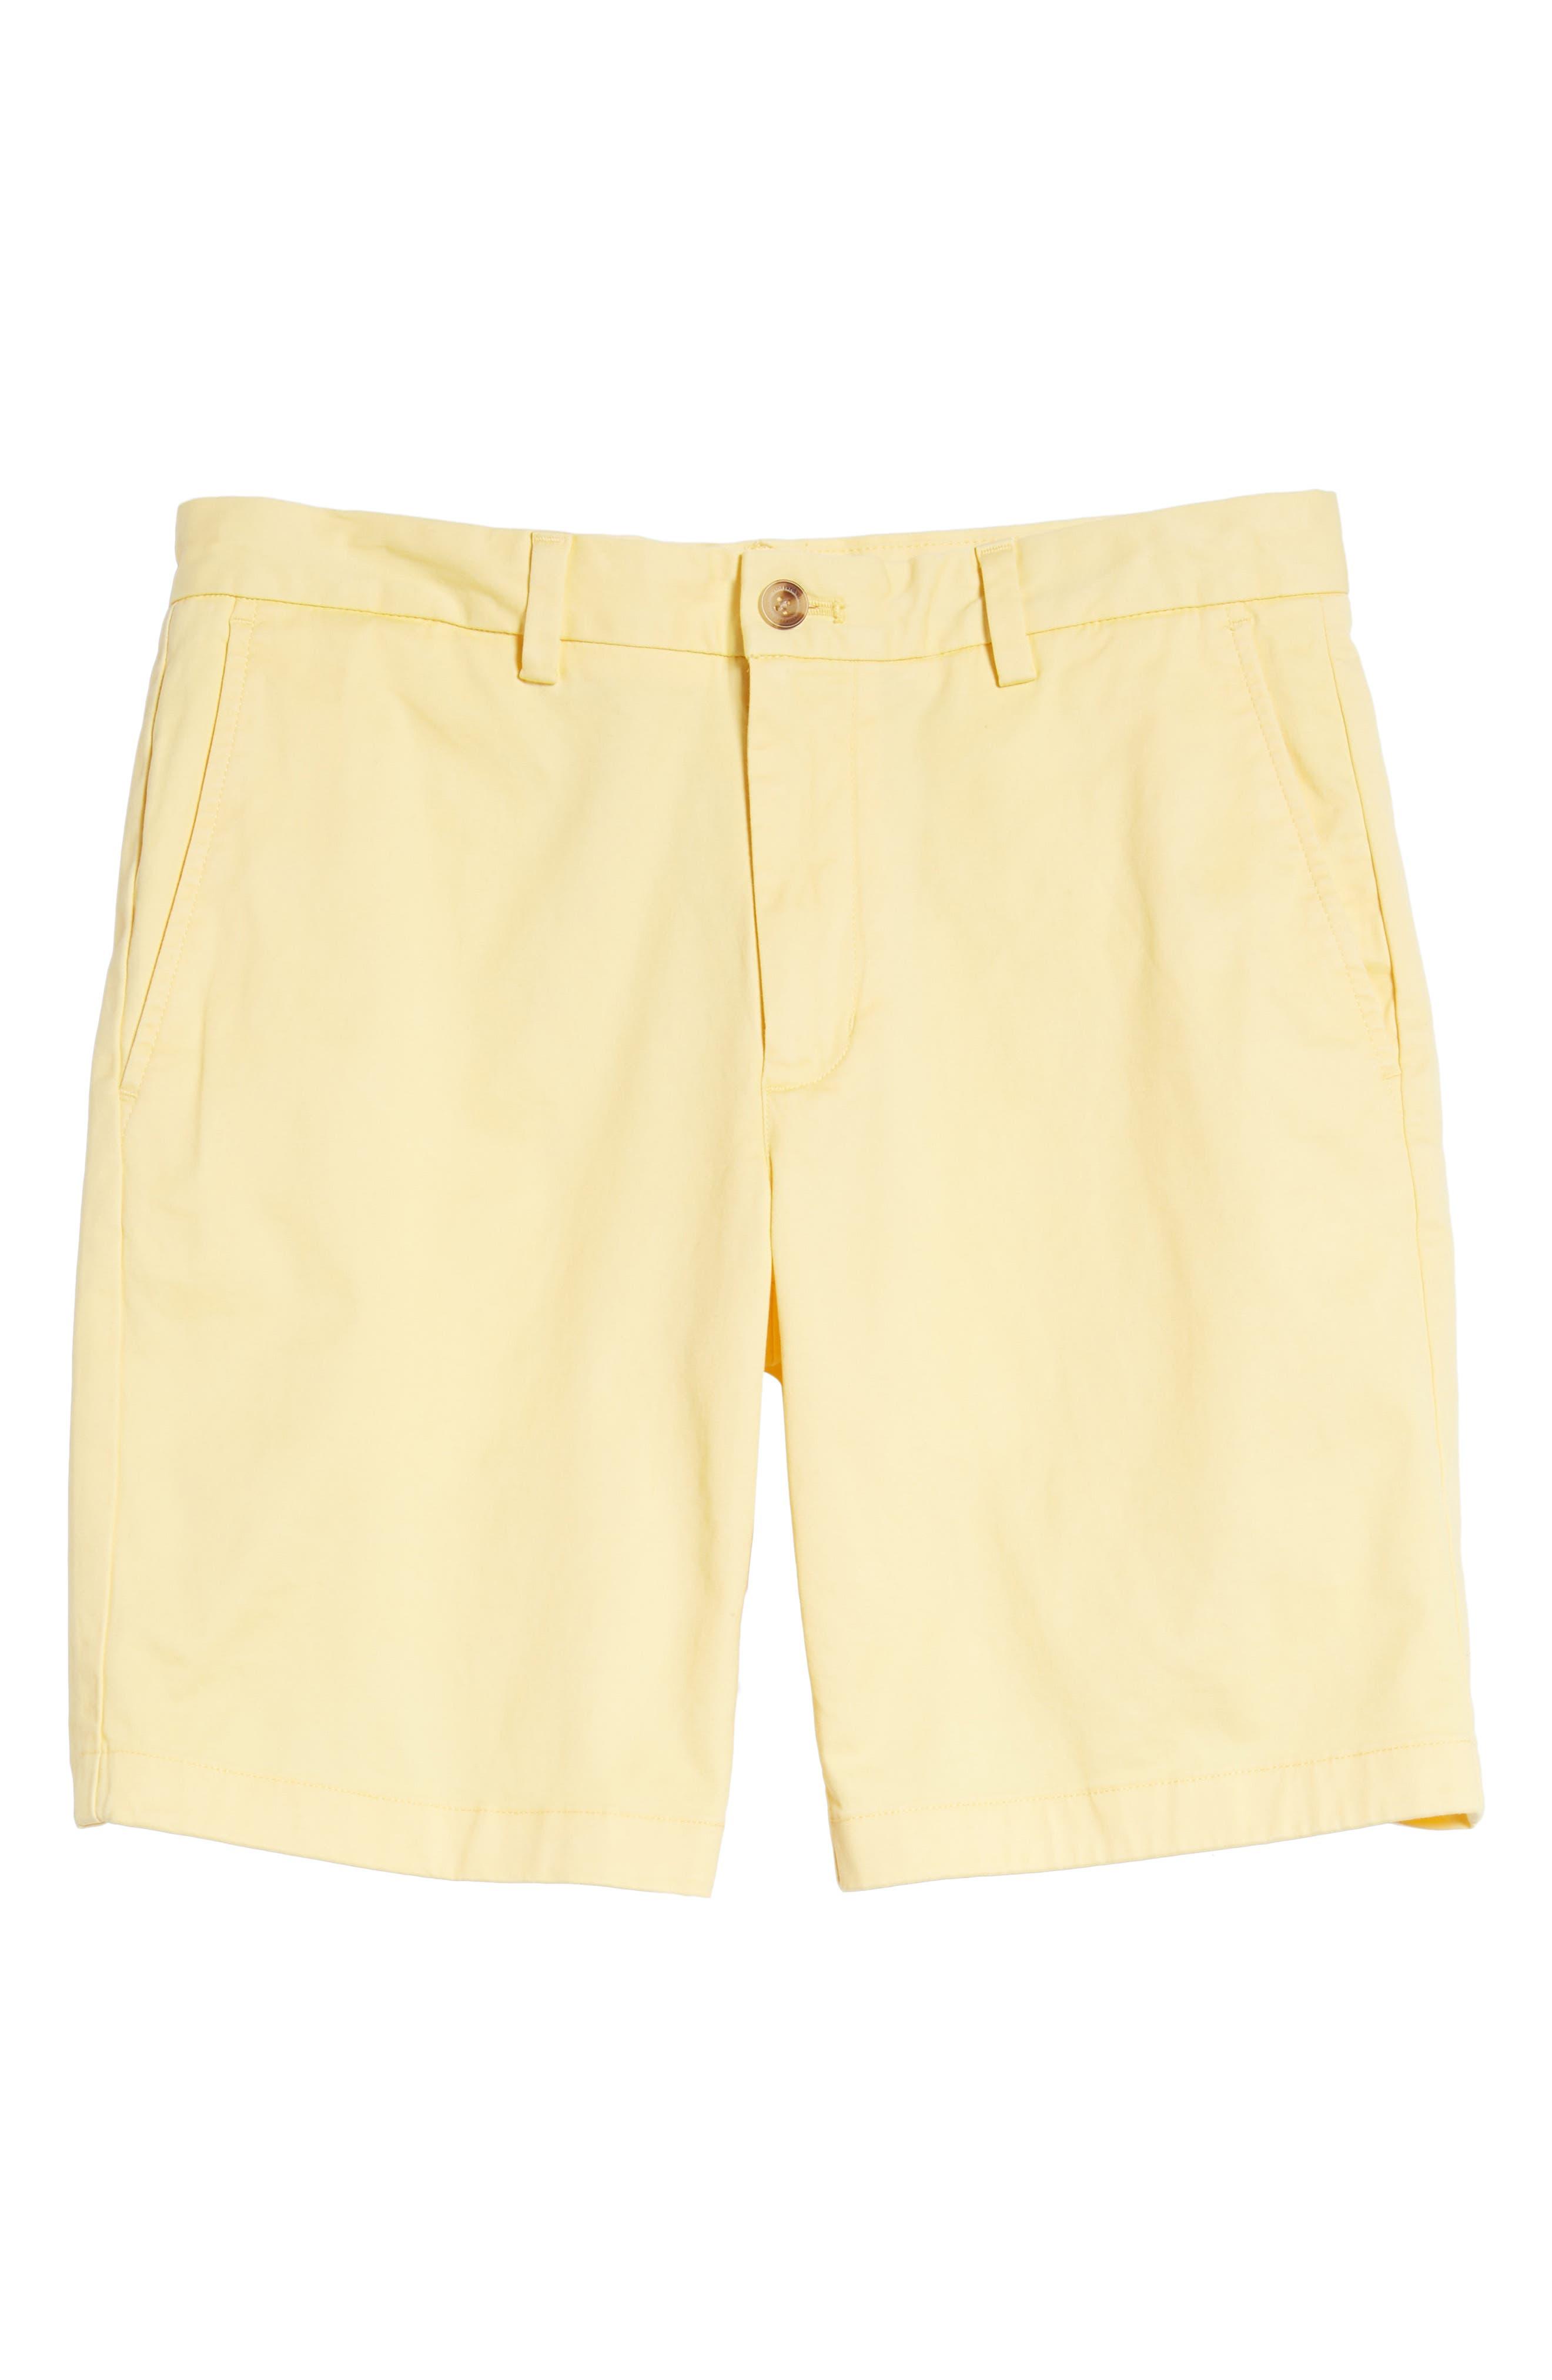 9 Inch Stretch Breaker Shorts,                             Alternate thumbnail 121, color,